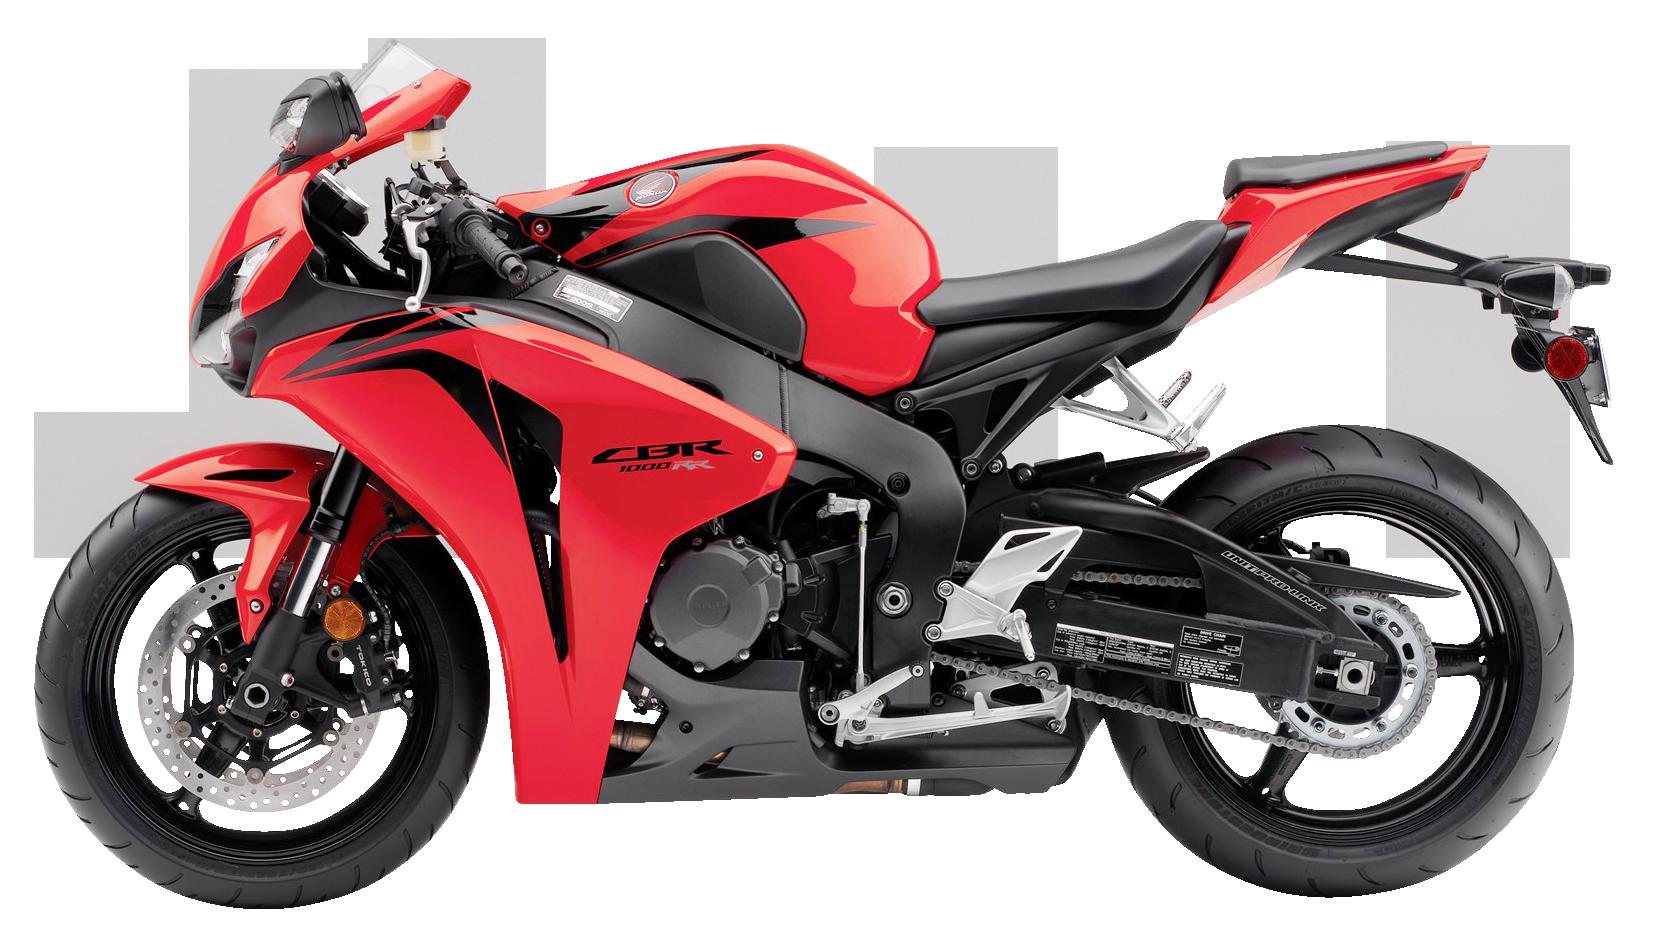 Red Honda CBR1000RR PNG Image